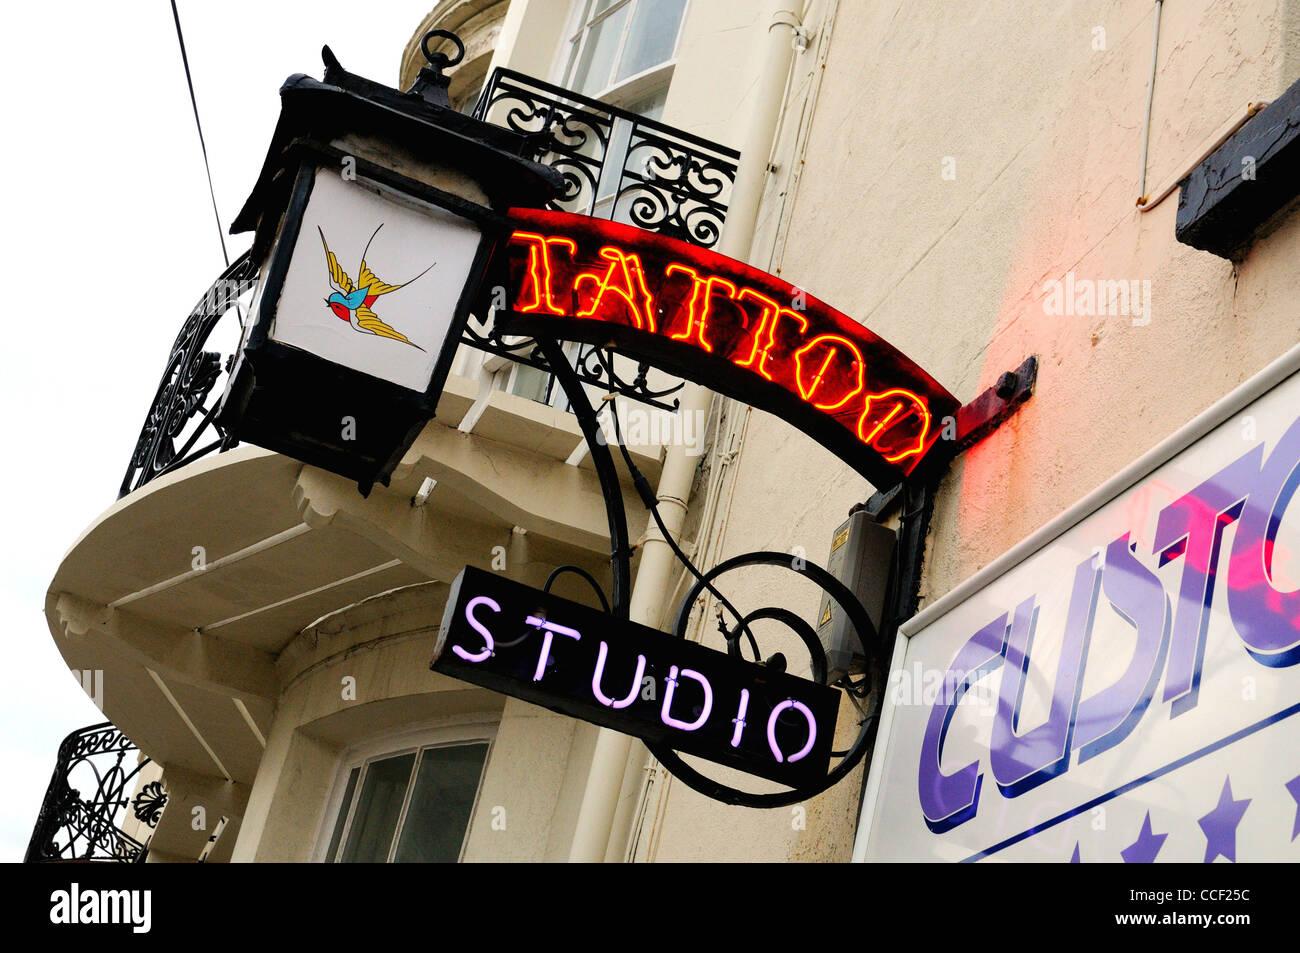 Detail of Tattooist's studio signs - Stock Image